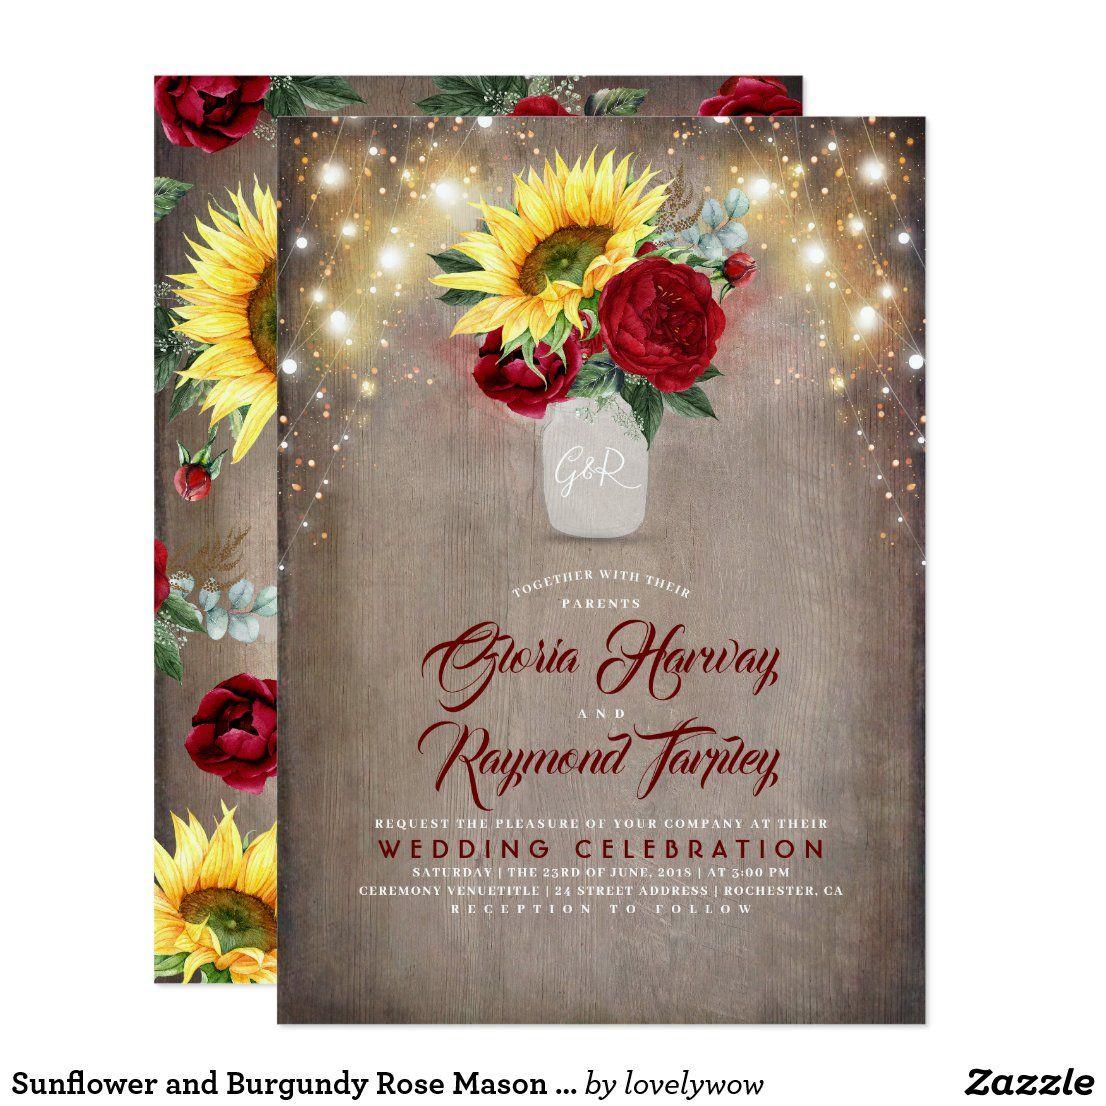 Sunflower and Burgundy Rose Mason Jar Fall Wedding Invitation | Zazzle.com